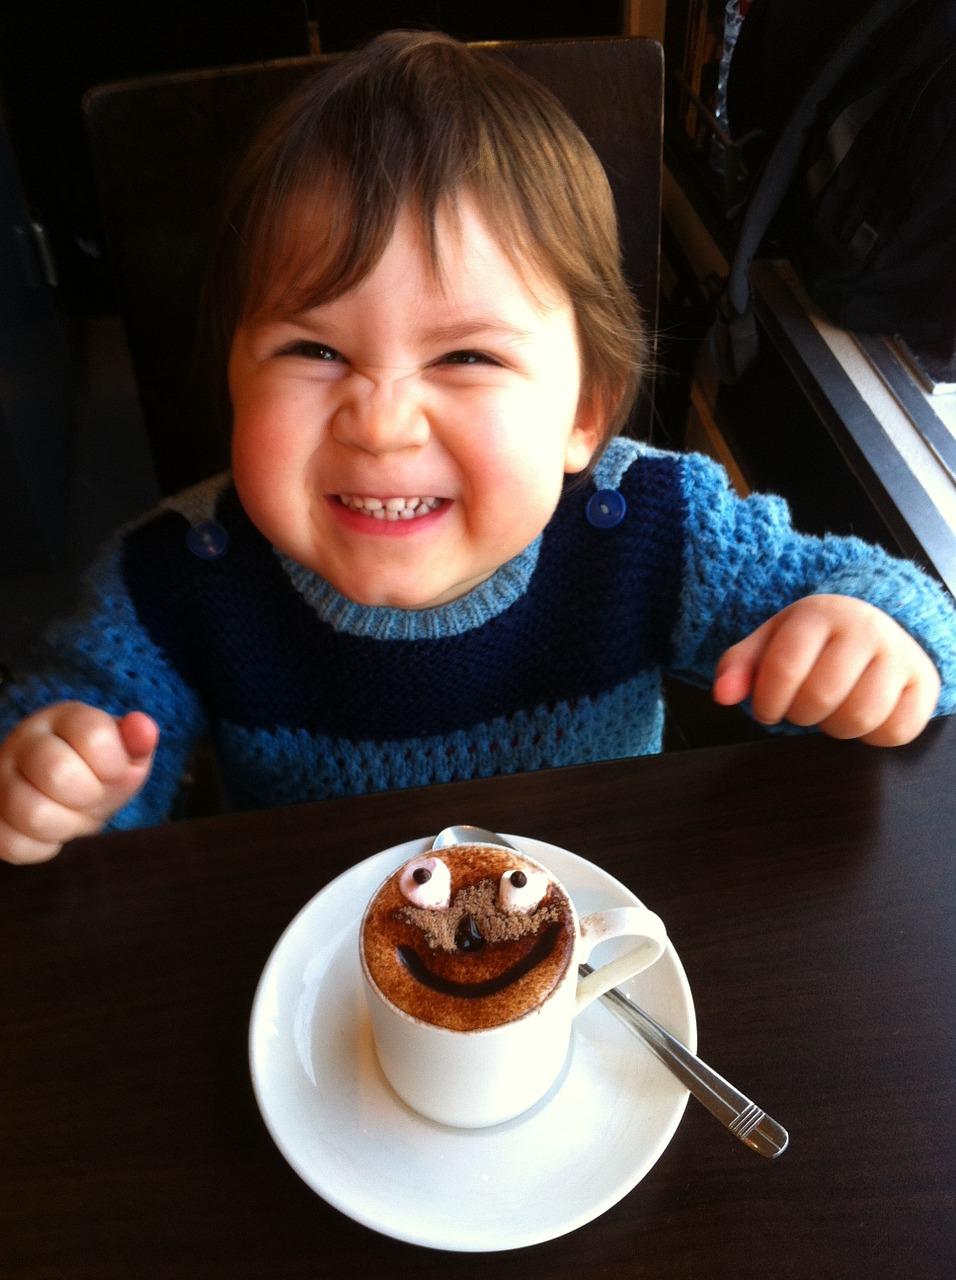 toddler-1326097_1280.jpg